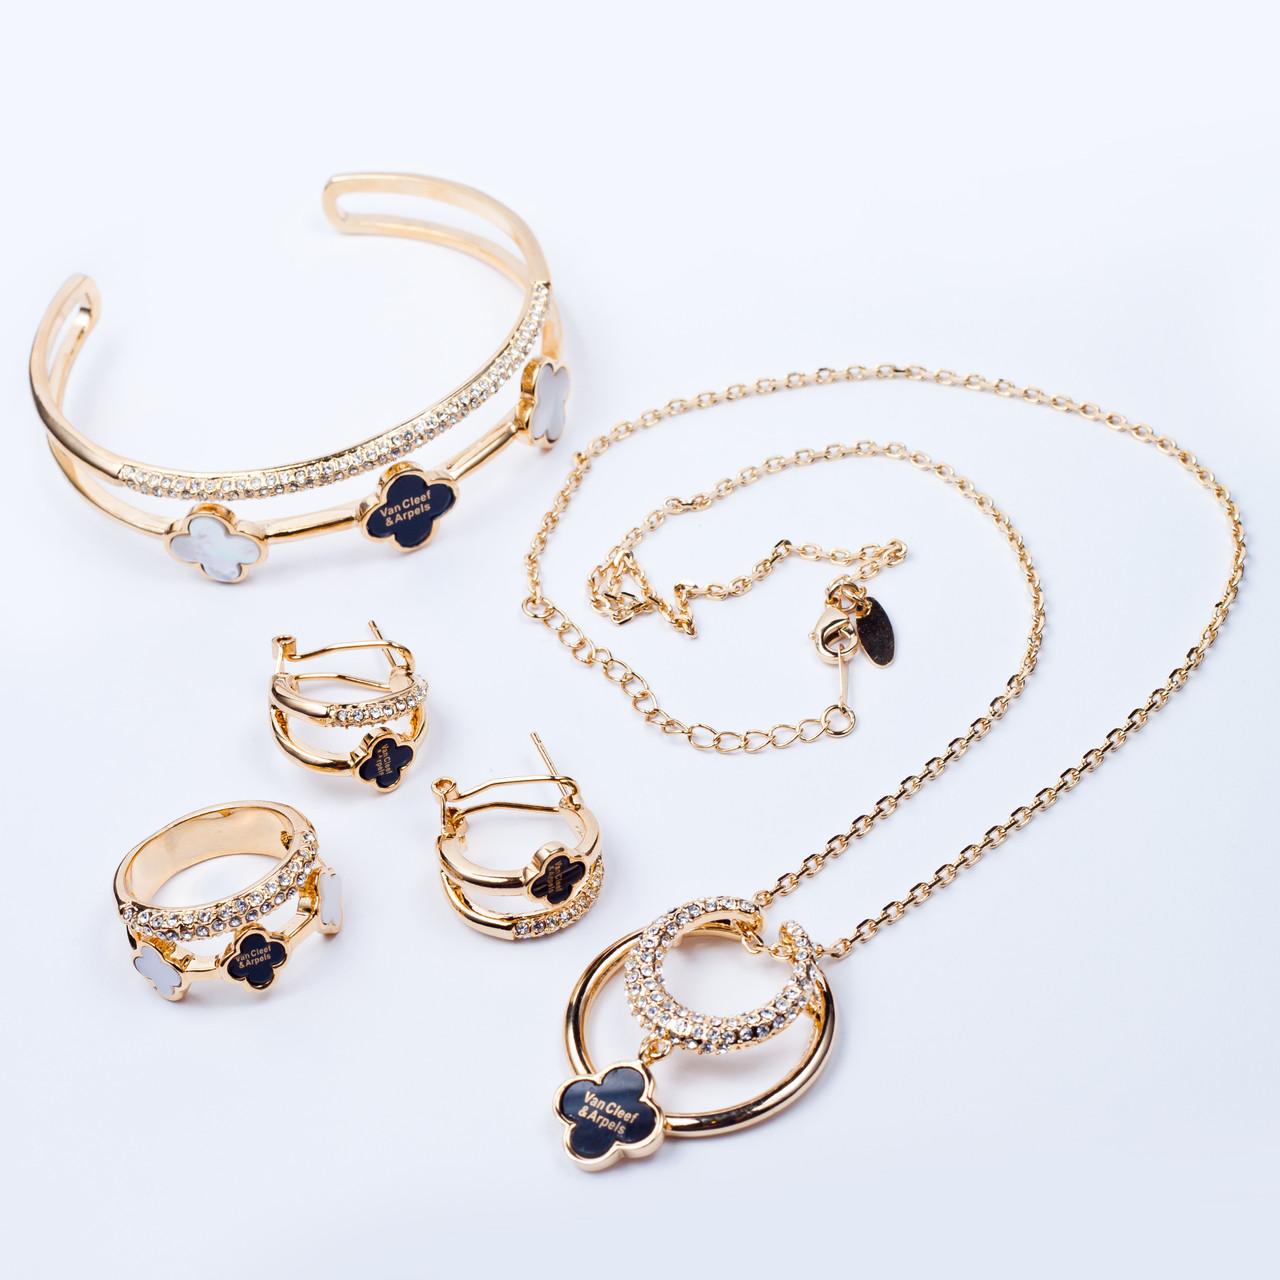 4e98aa46a332 Набор (Серьги, кольцо, кулон с цепочкой, браслет)  продажа, цена в ...